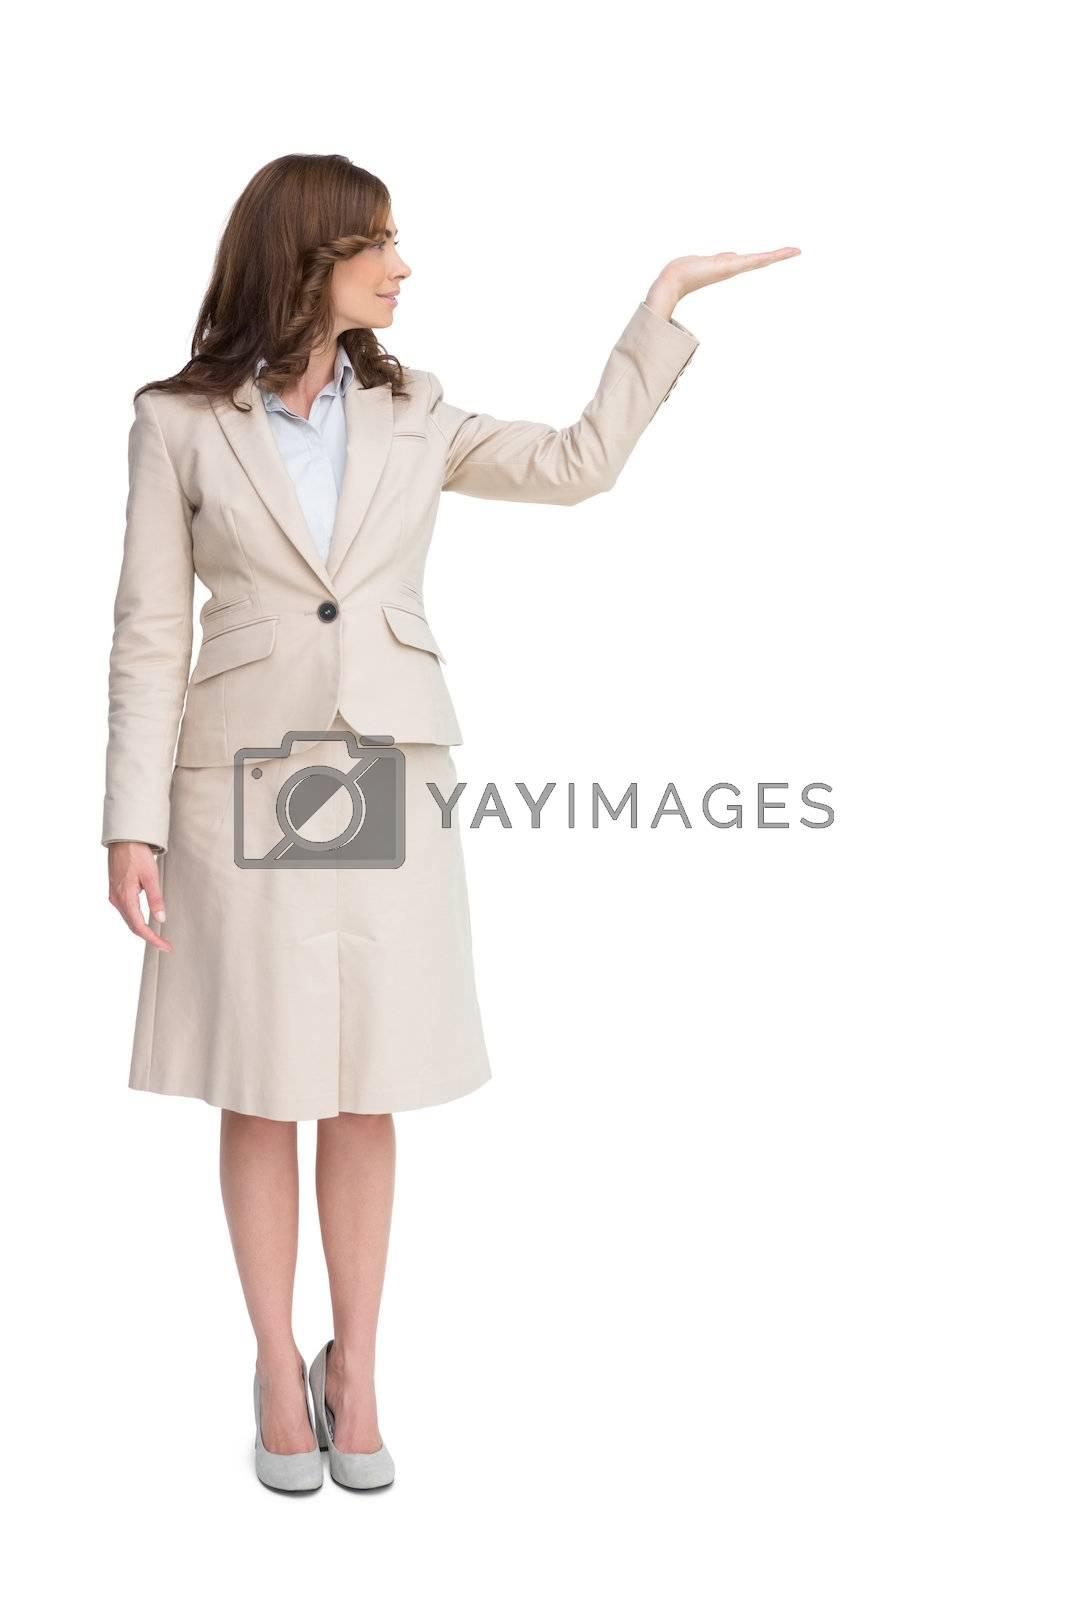 Businesswoman with empty hand open by Wavebreakmedia